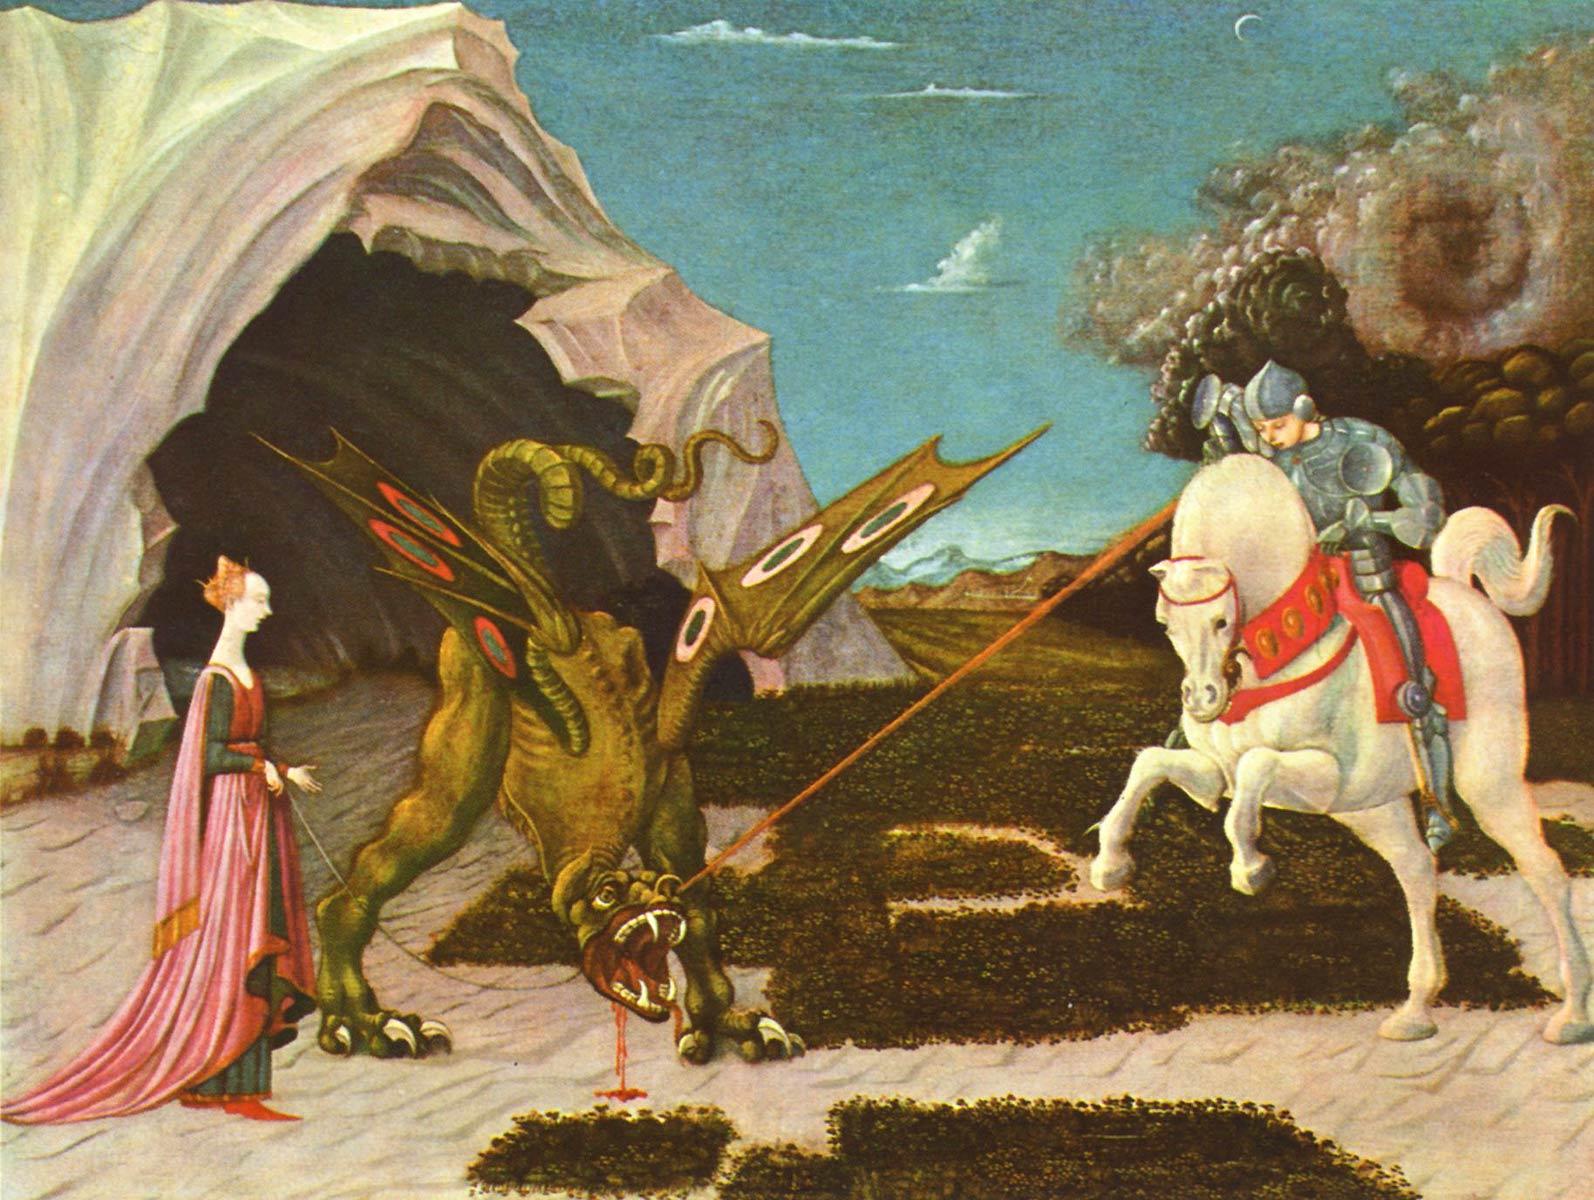 Drachen Mittelalter Wiki Fandom Powered By Wikia